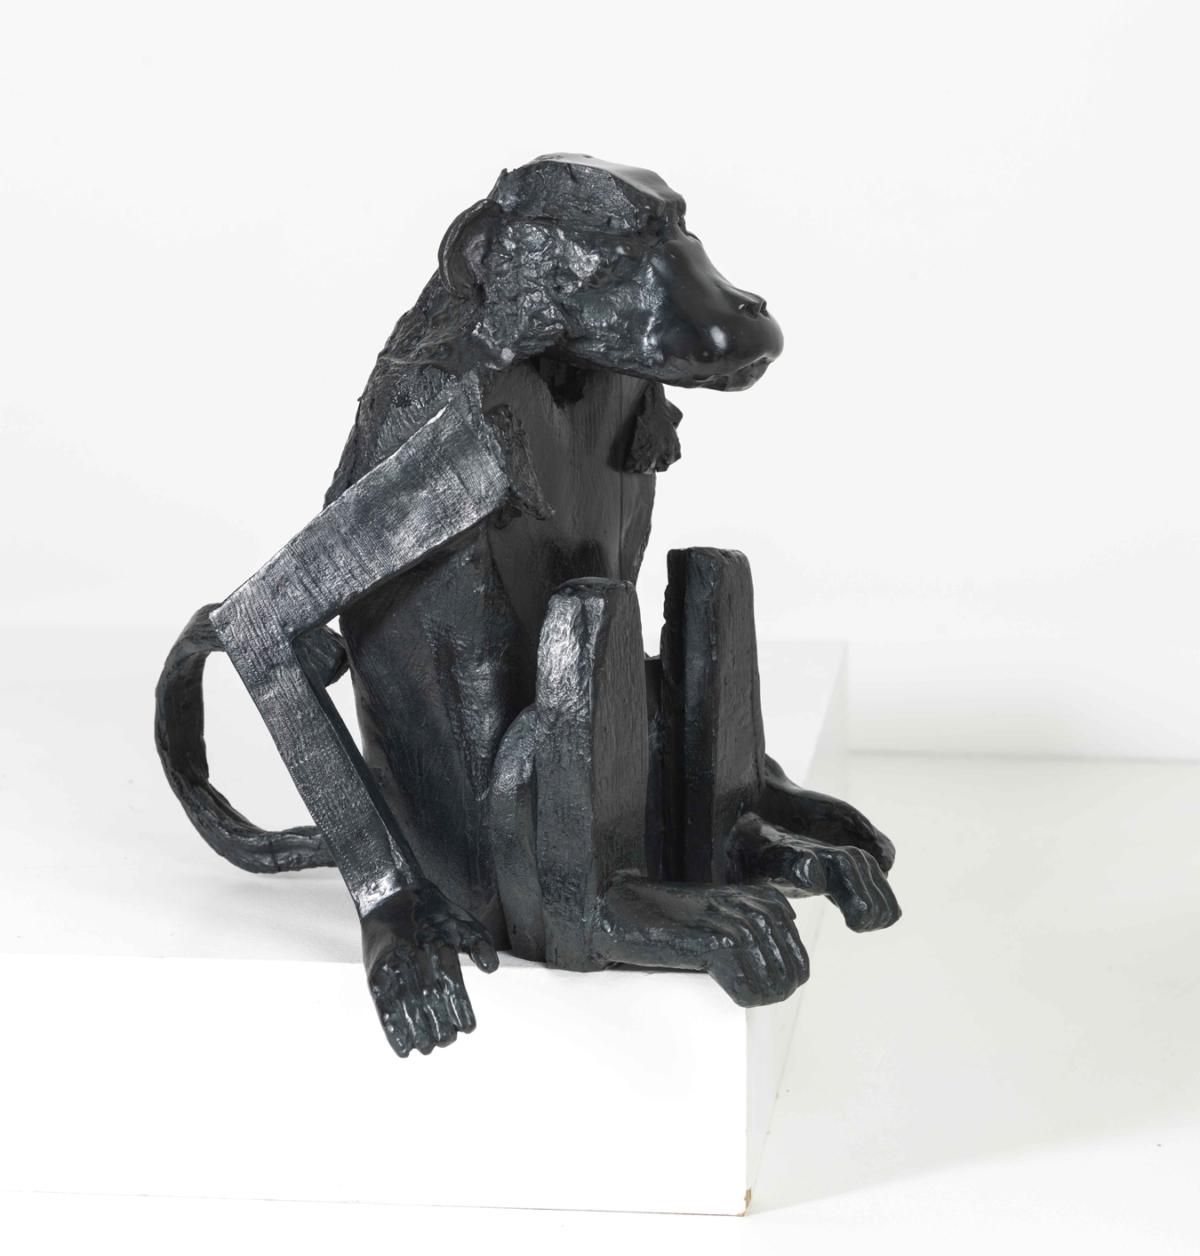 Singe Sculpture en bronze ©Denis Polge